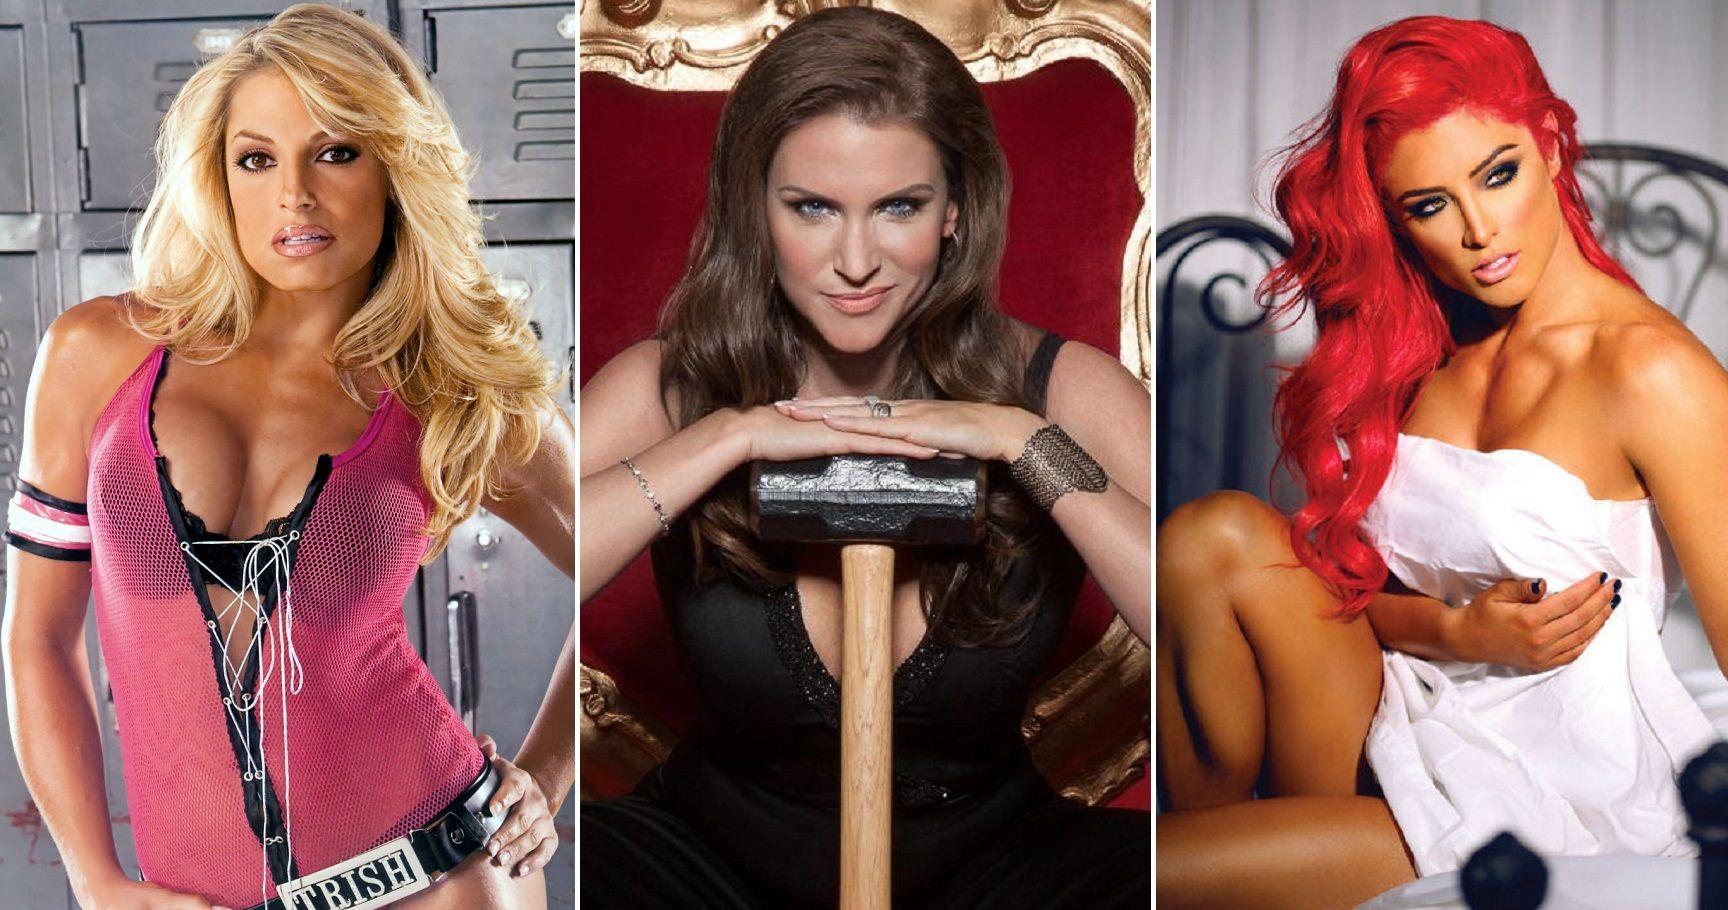 Top 15 WWE Women You Wish You Could Marry